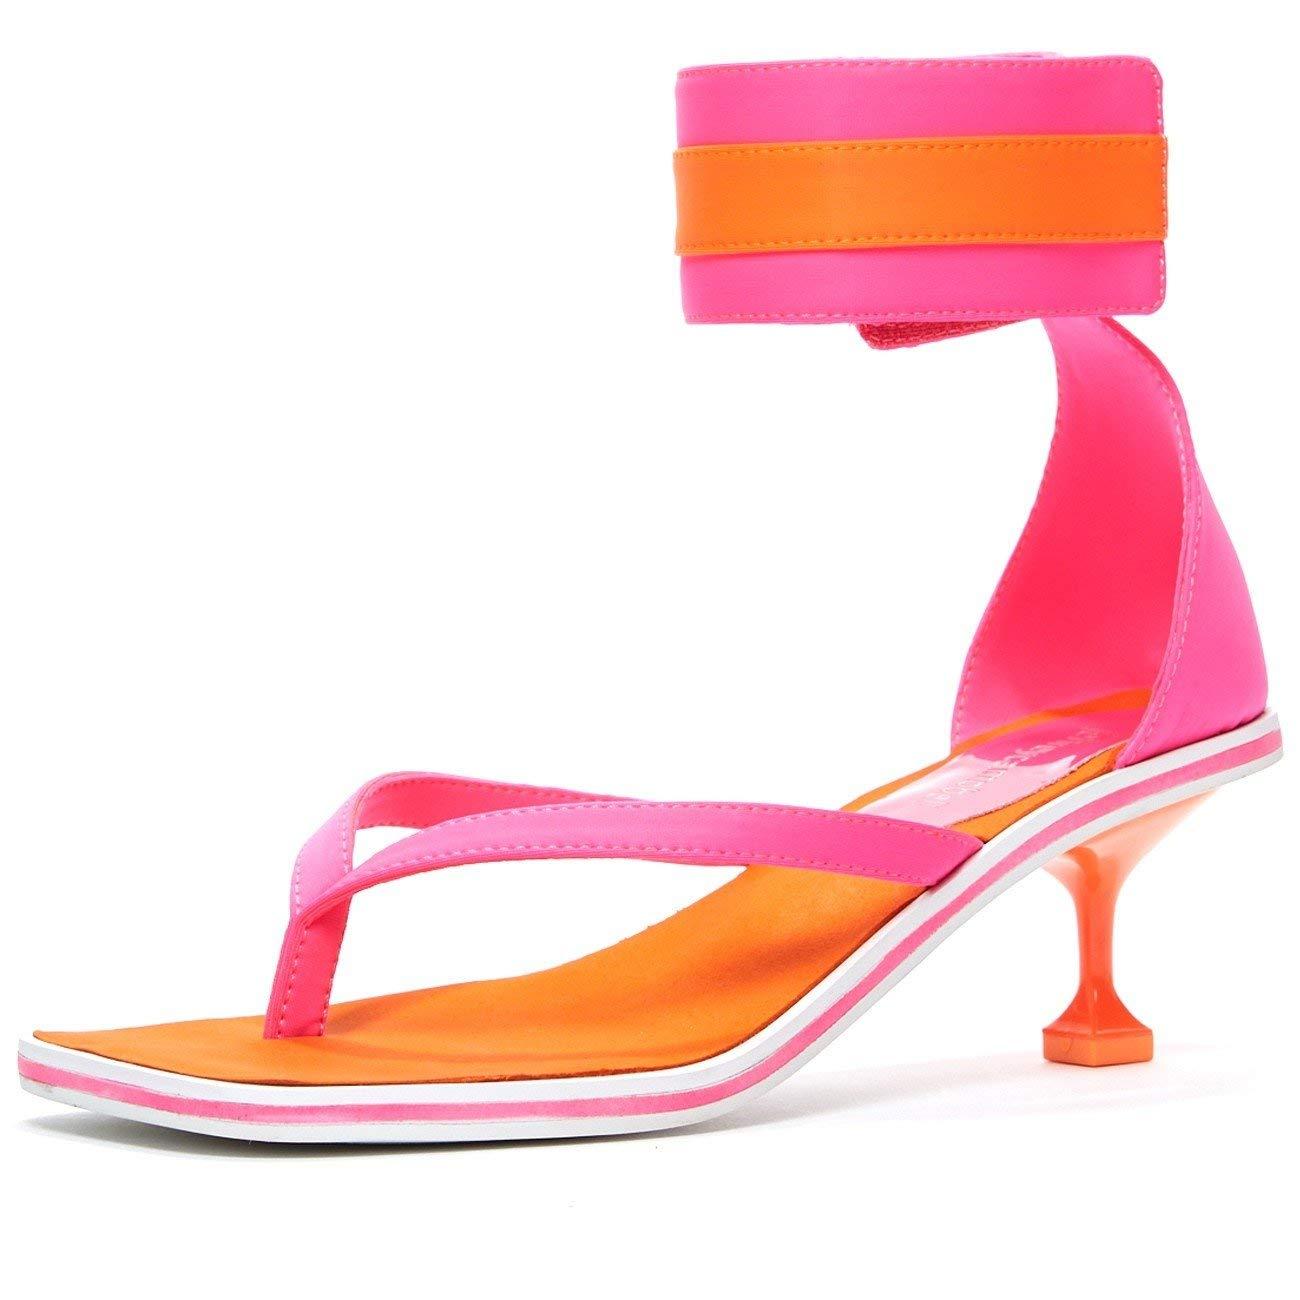 34e1613c70b Get Quotations · Jeffrey Campbell Dribble Sporty Kitten Heel Neoprene Sandal  Pink Orange